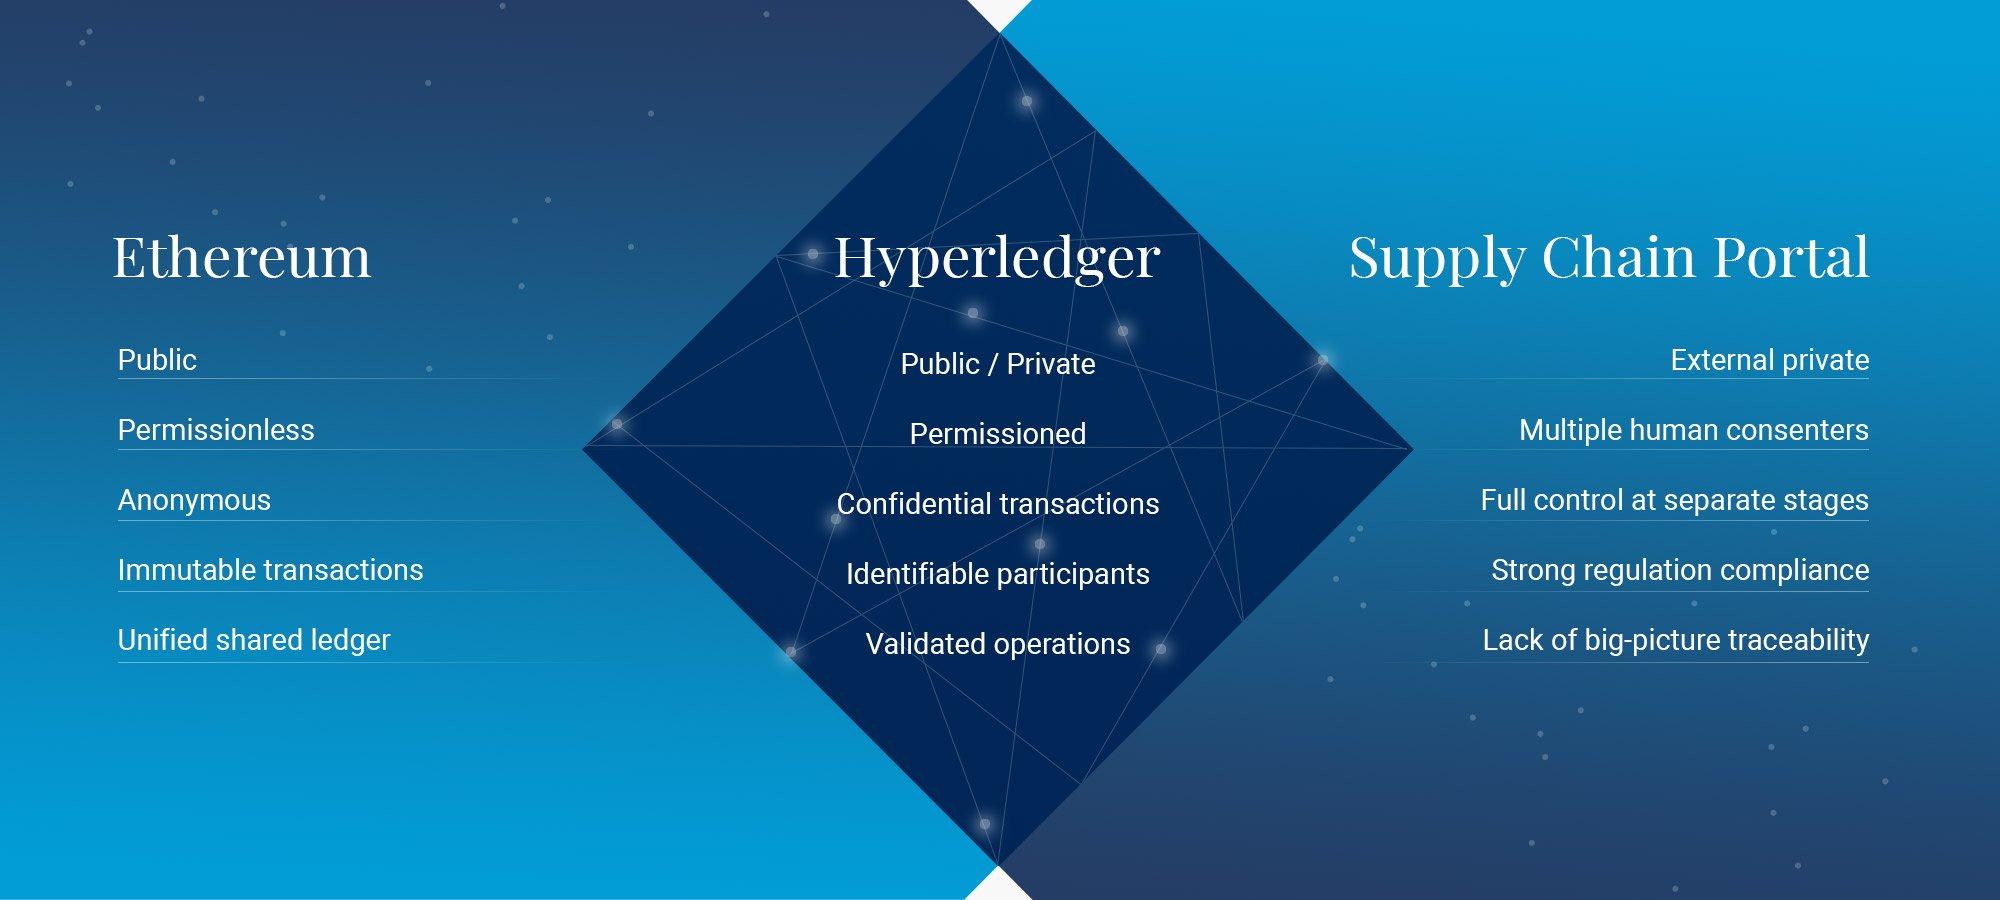 Hyperledger Ethereum Supply Chain Portal